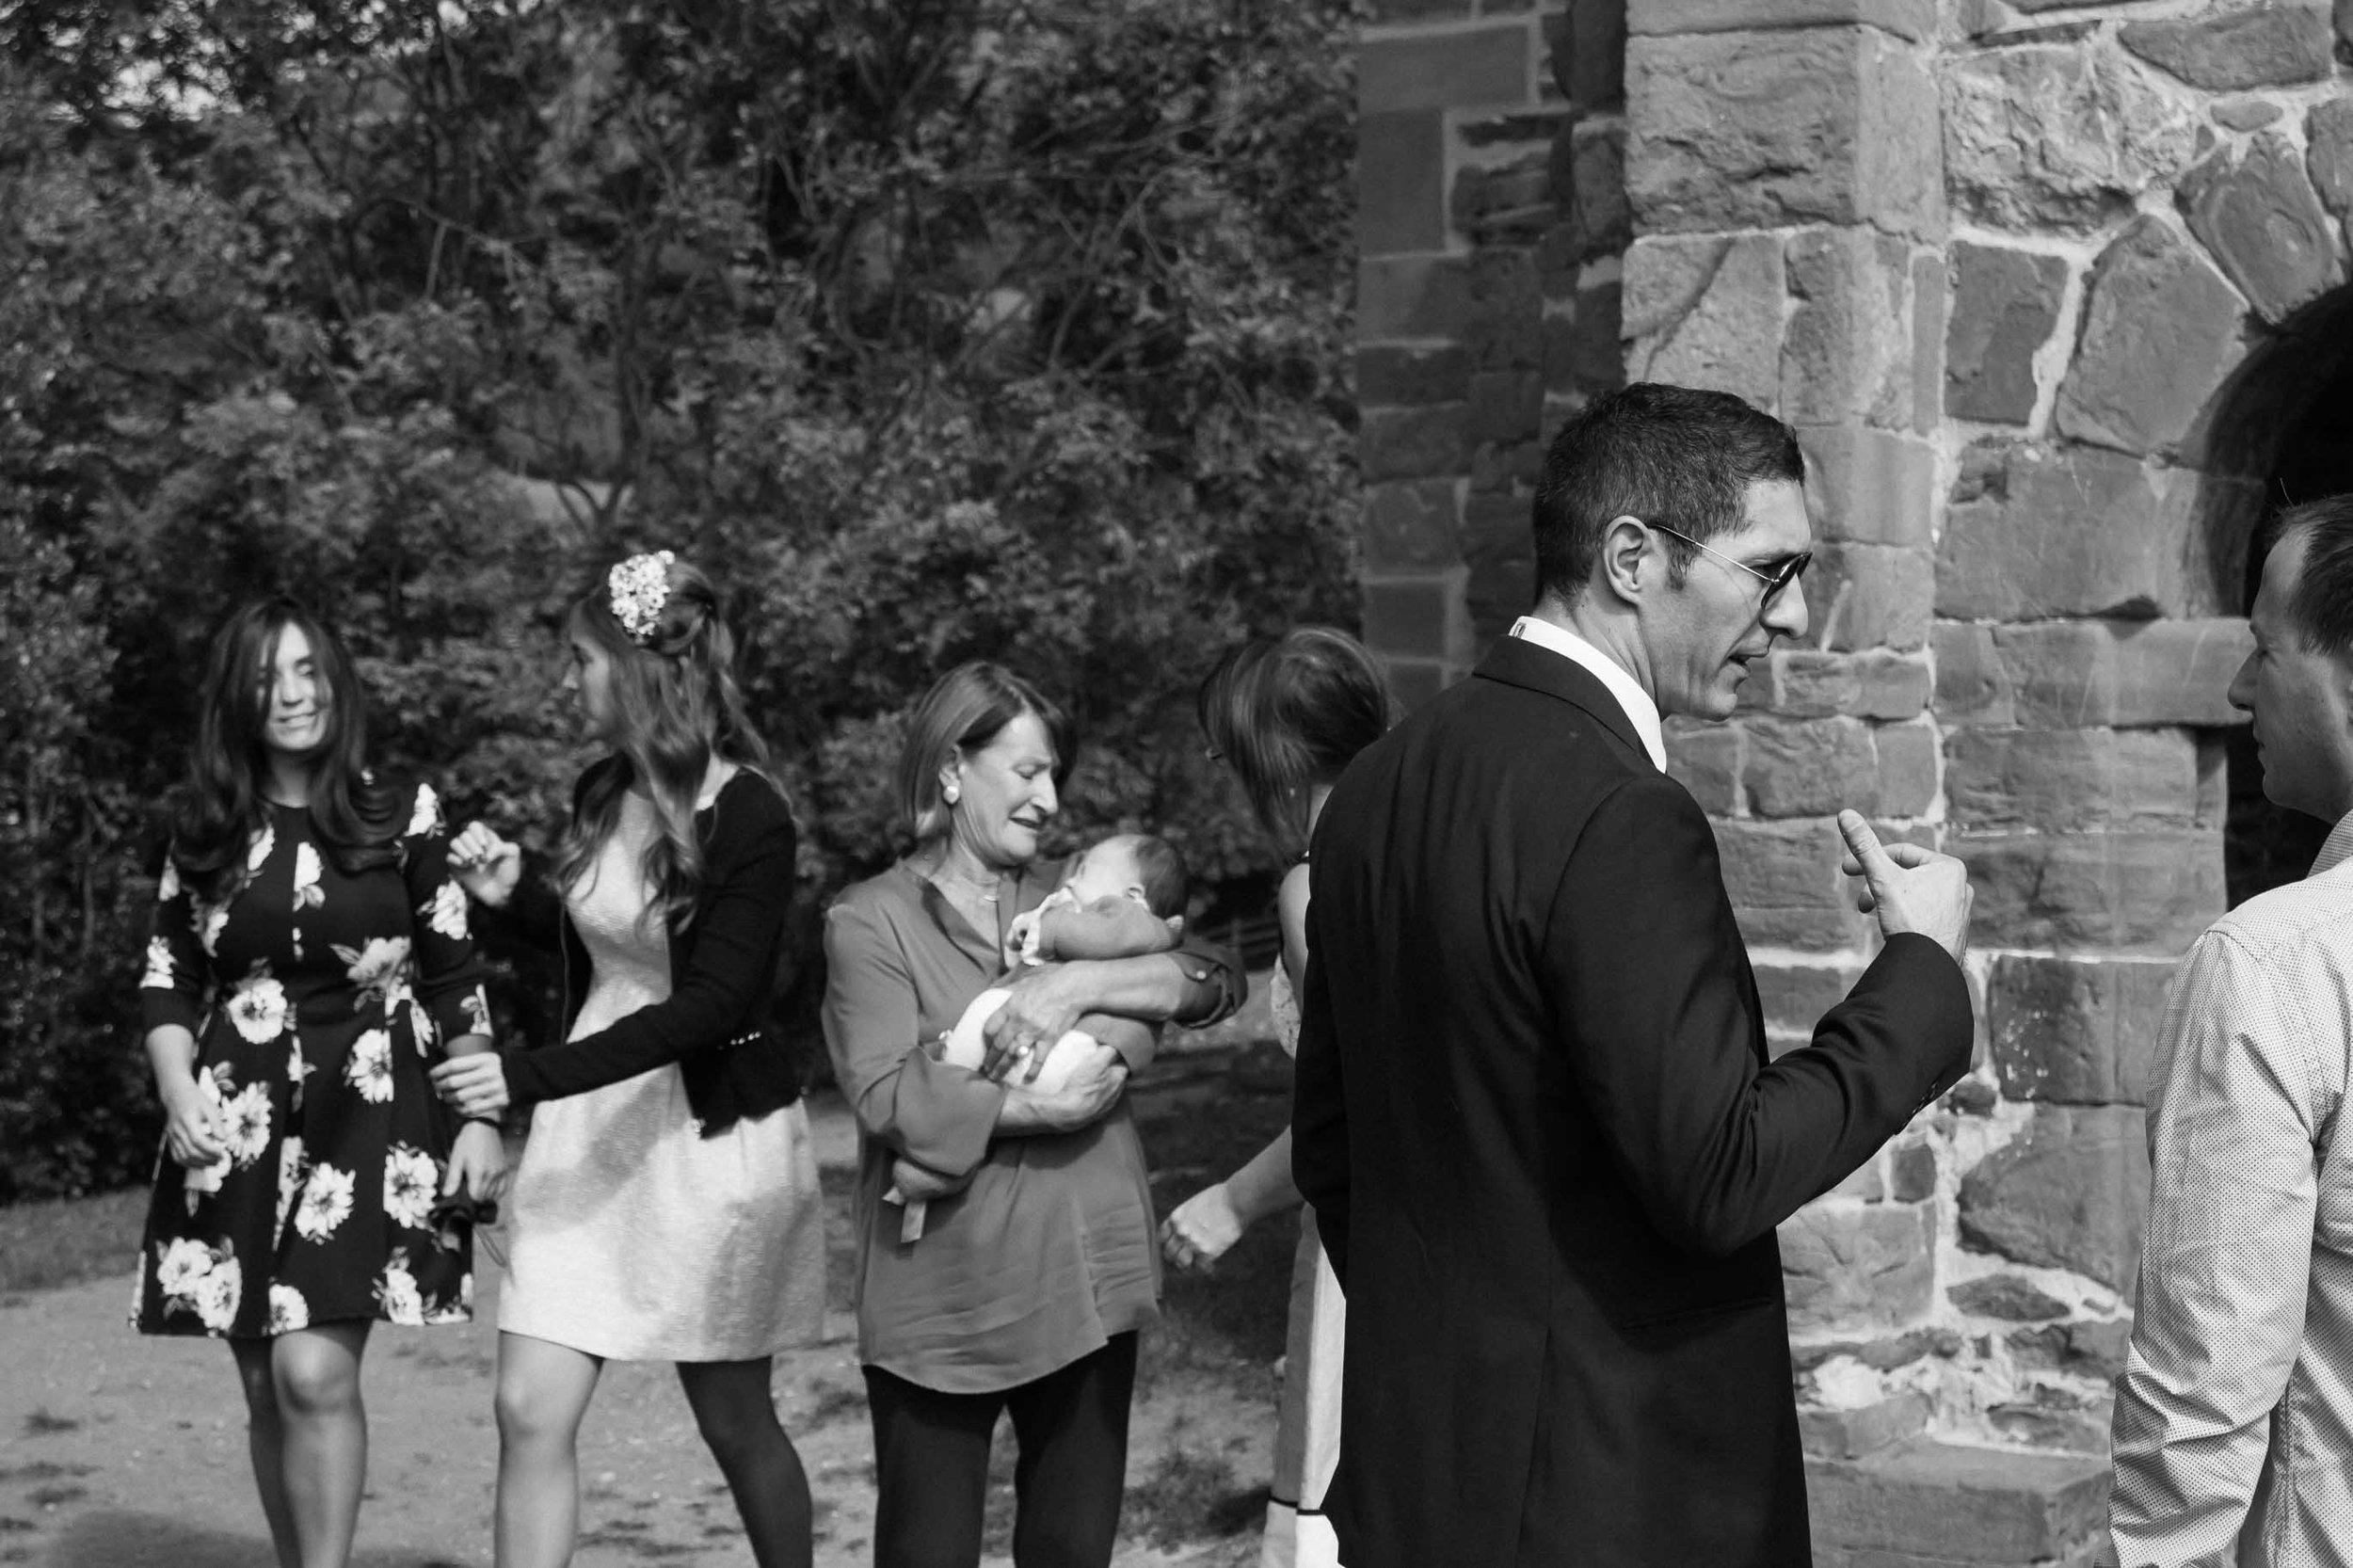 bautizo en pola de lena asturias fotografo bebes-18.JPG